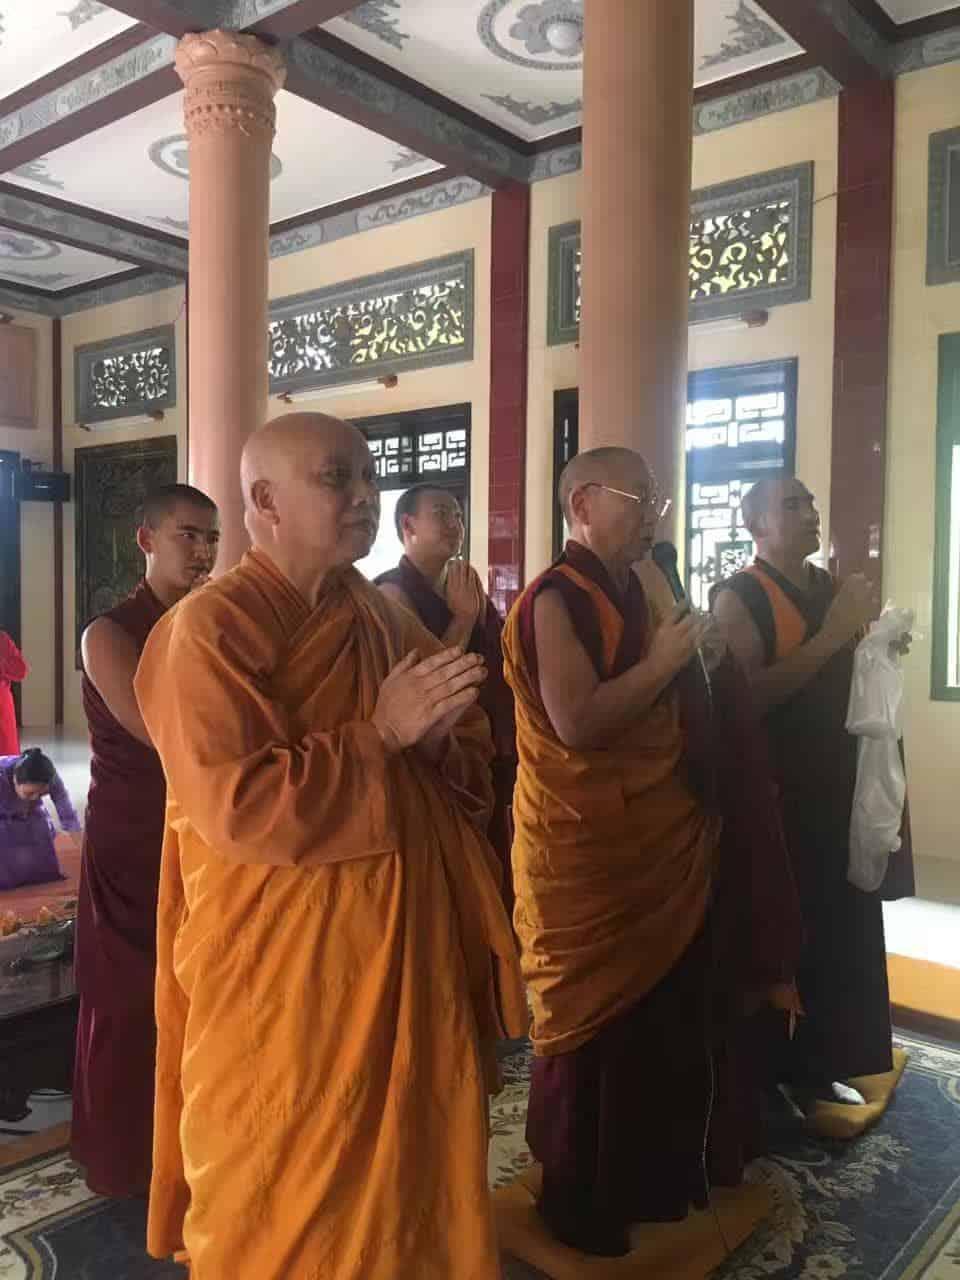 Gosok Rinpoche Vietnam 2017-03-06 42ed90559f8a43af7fb0e522d610085